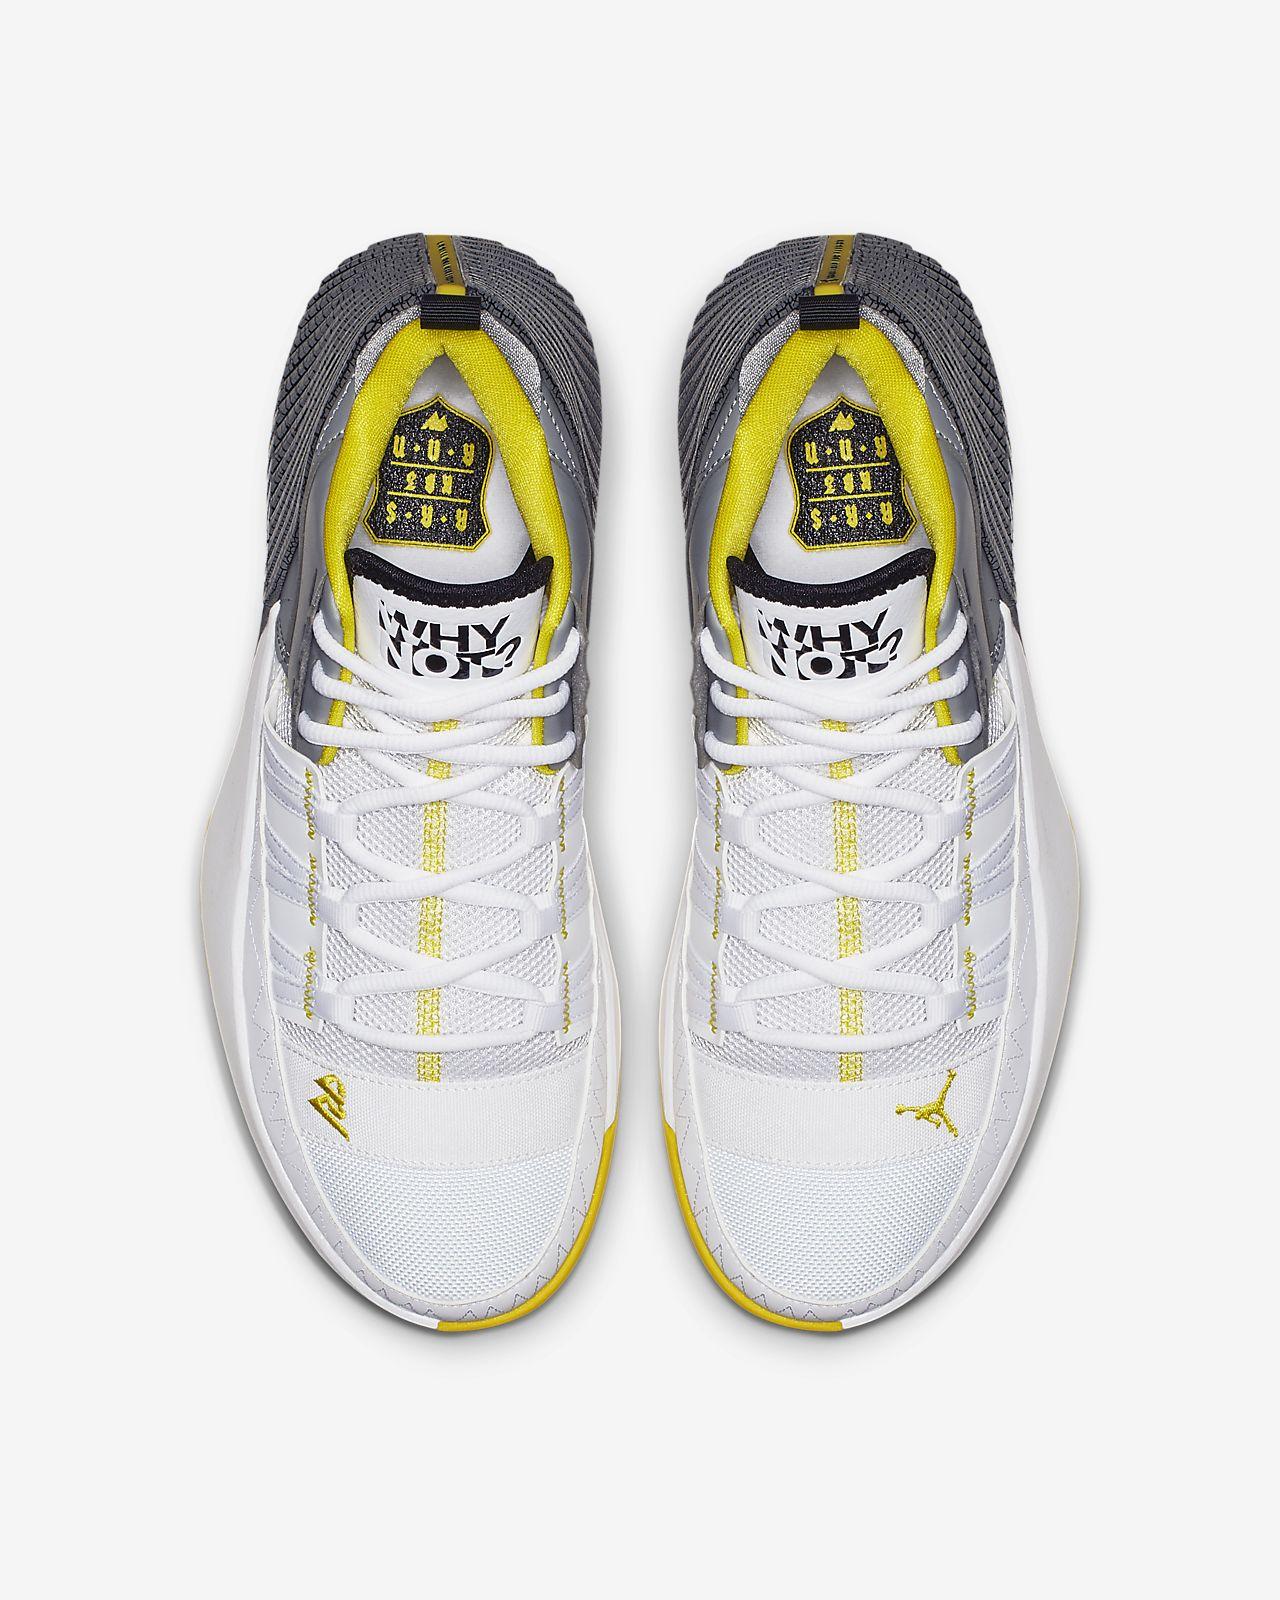 promo code 497c0 a6110 ... Jordan